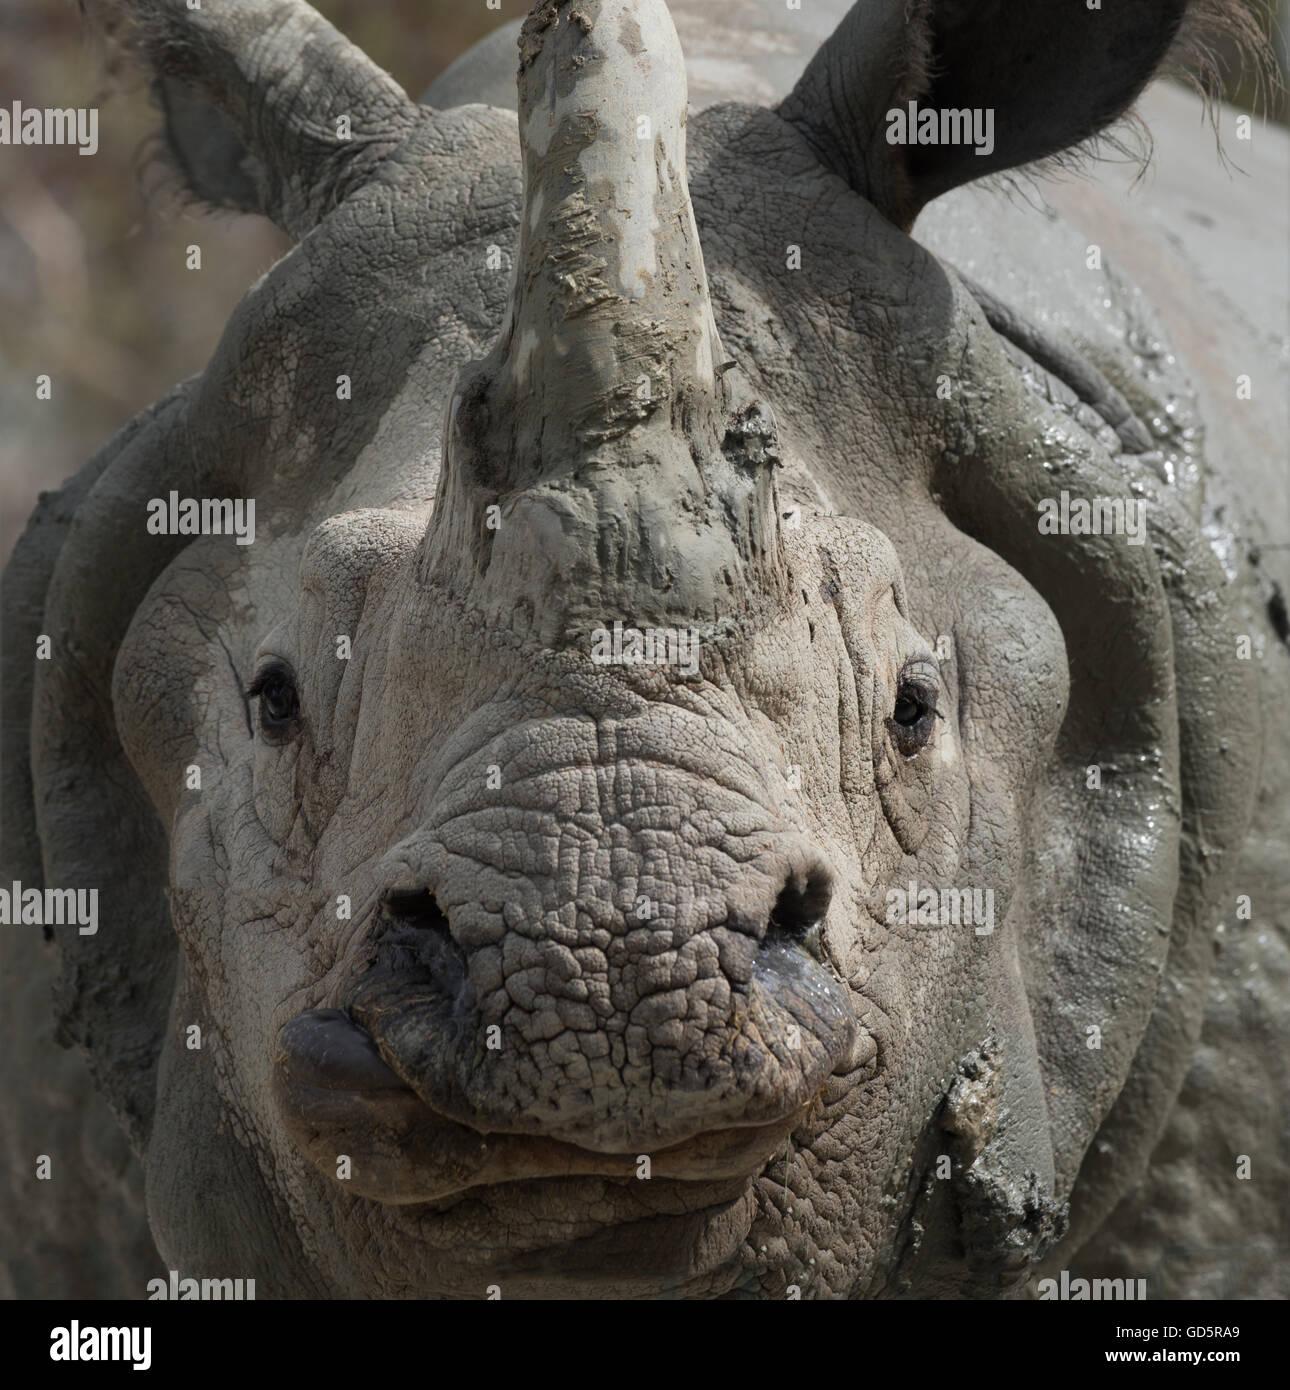 White Rhino close-up series - Stock Image